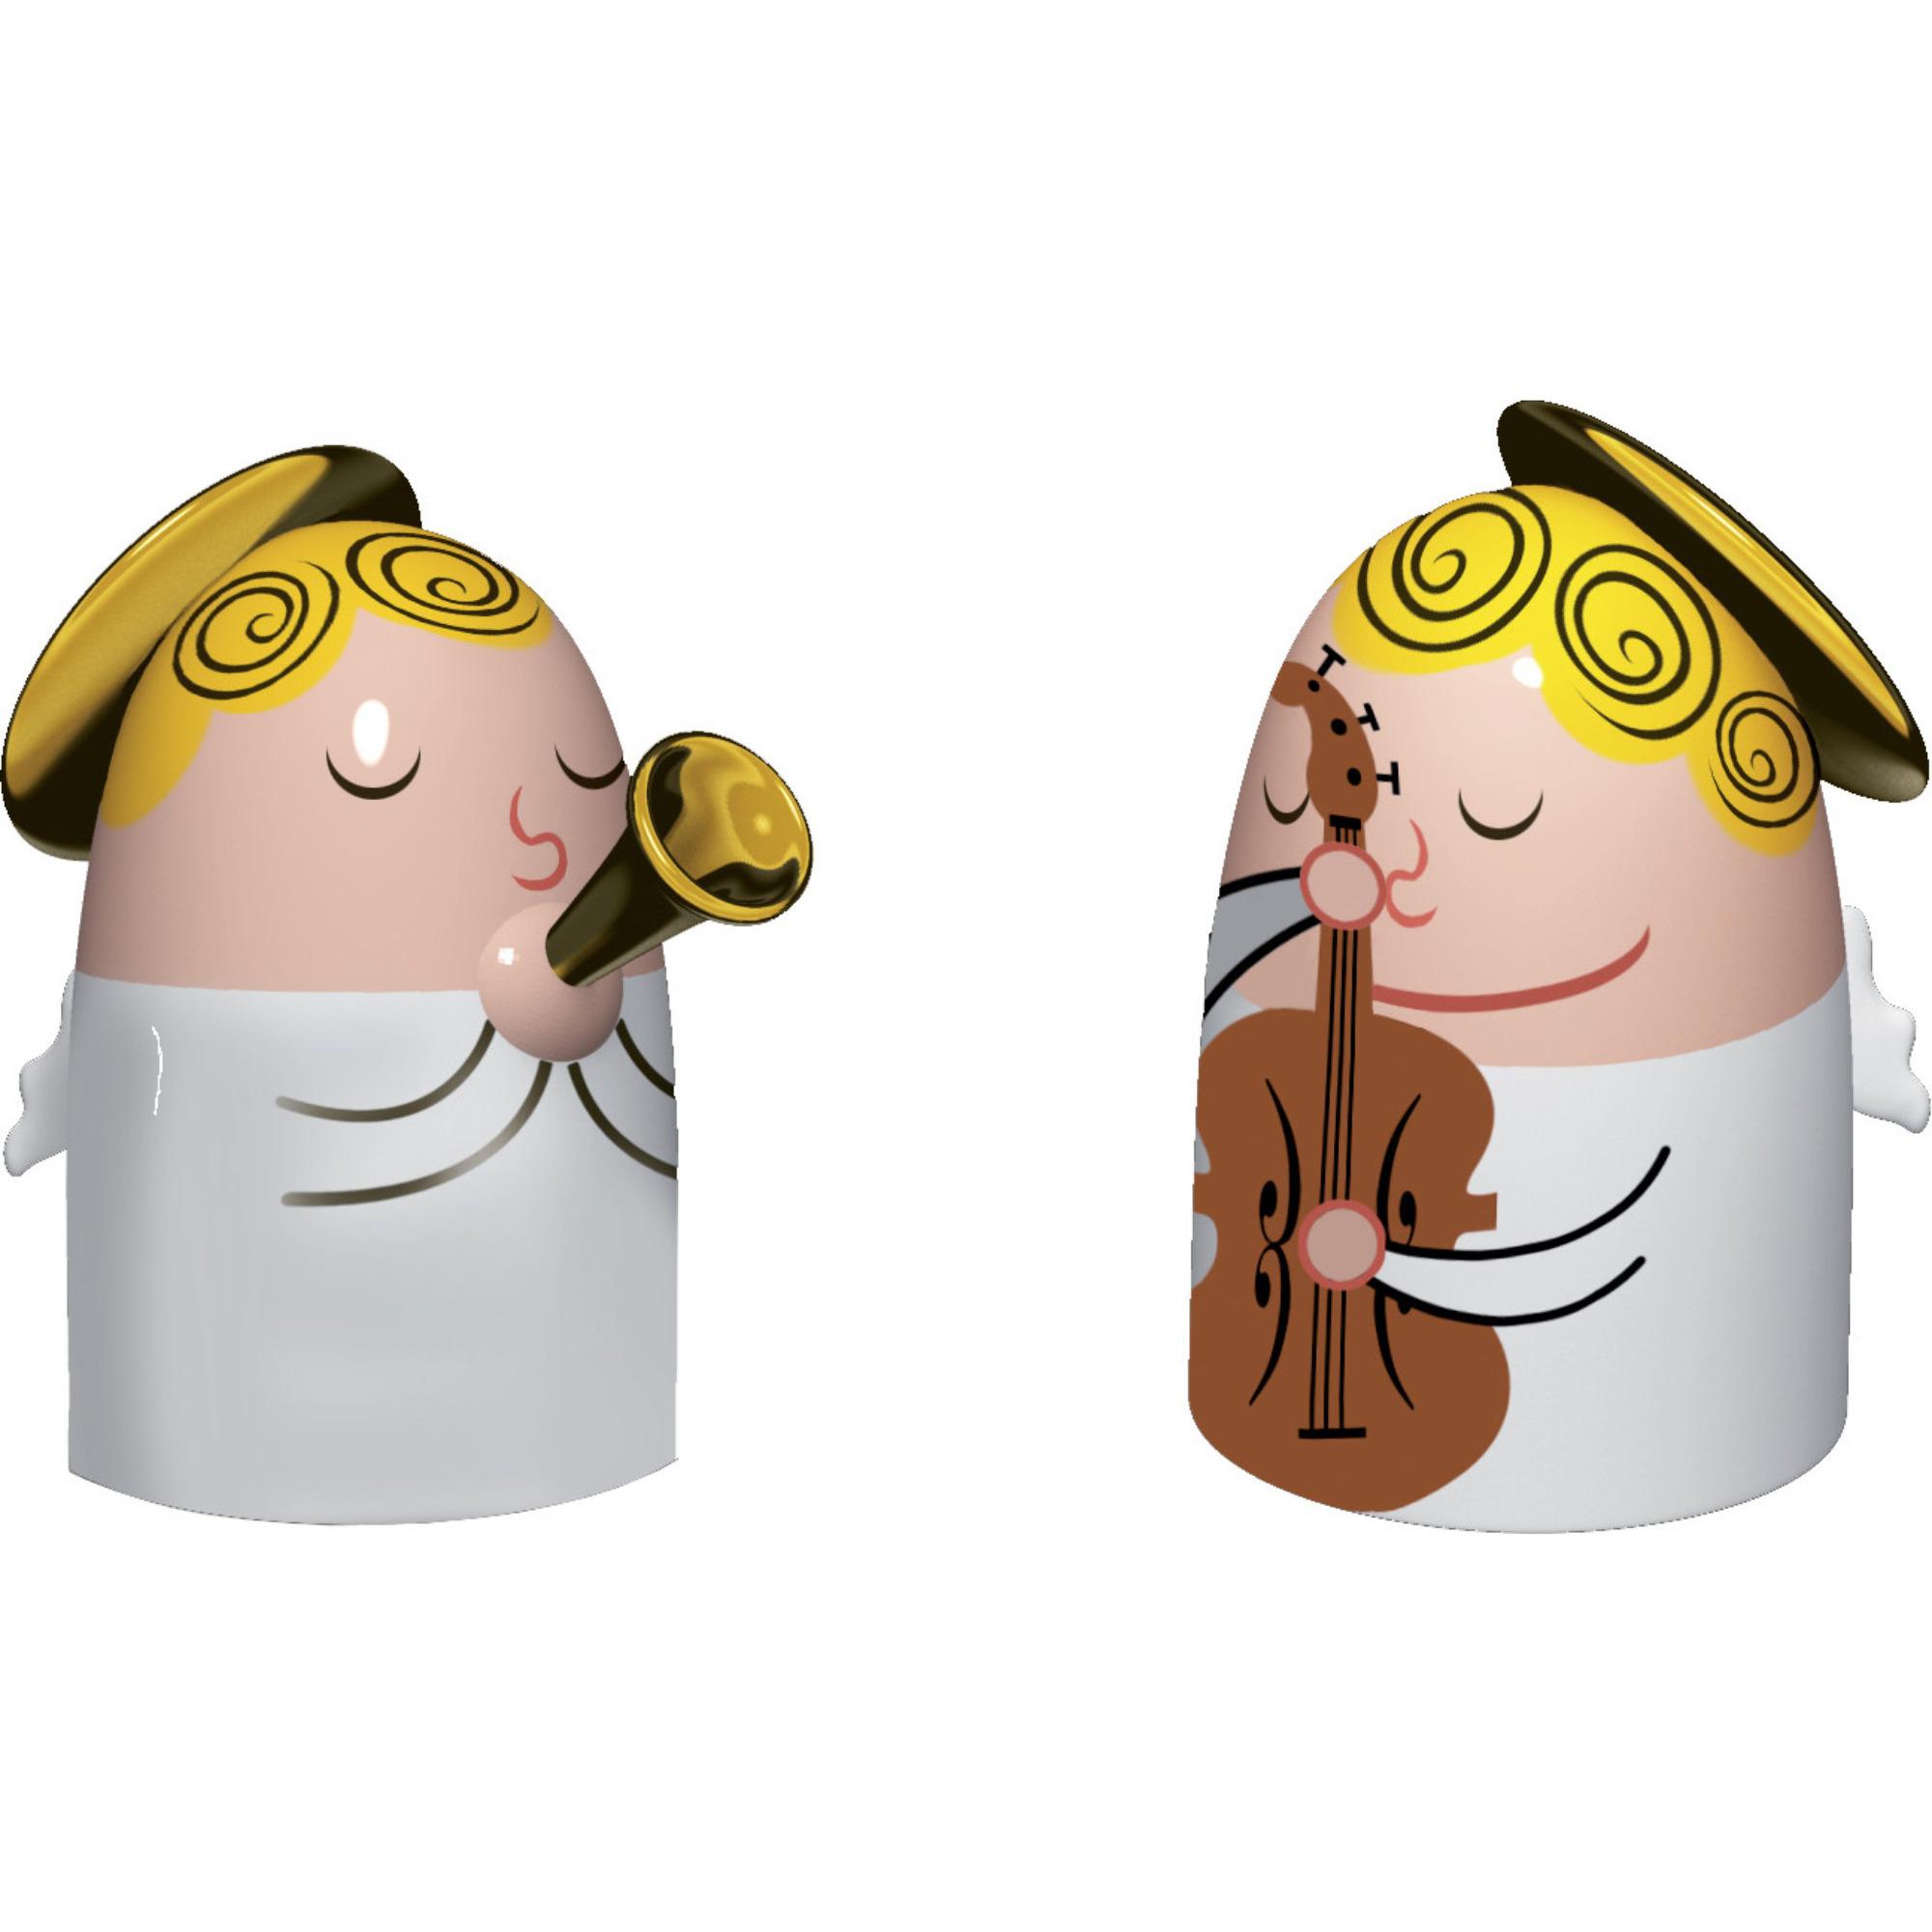 Alessi Porslinsfigurer Änglar 2 st